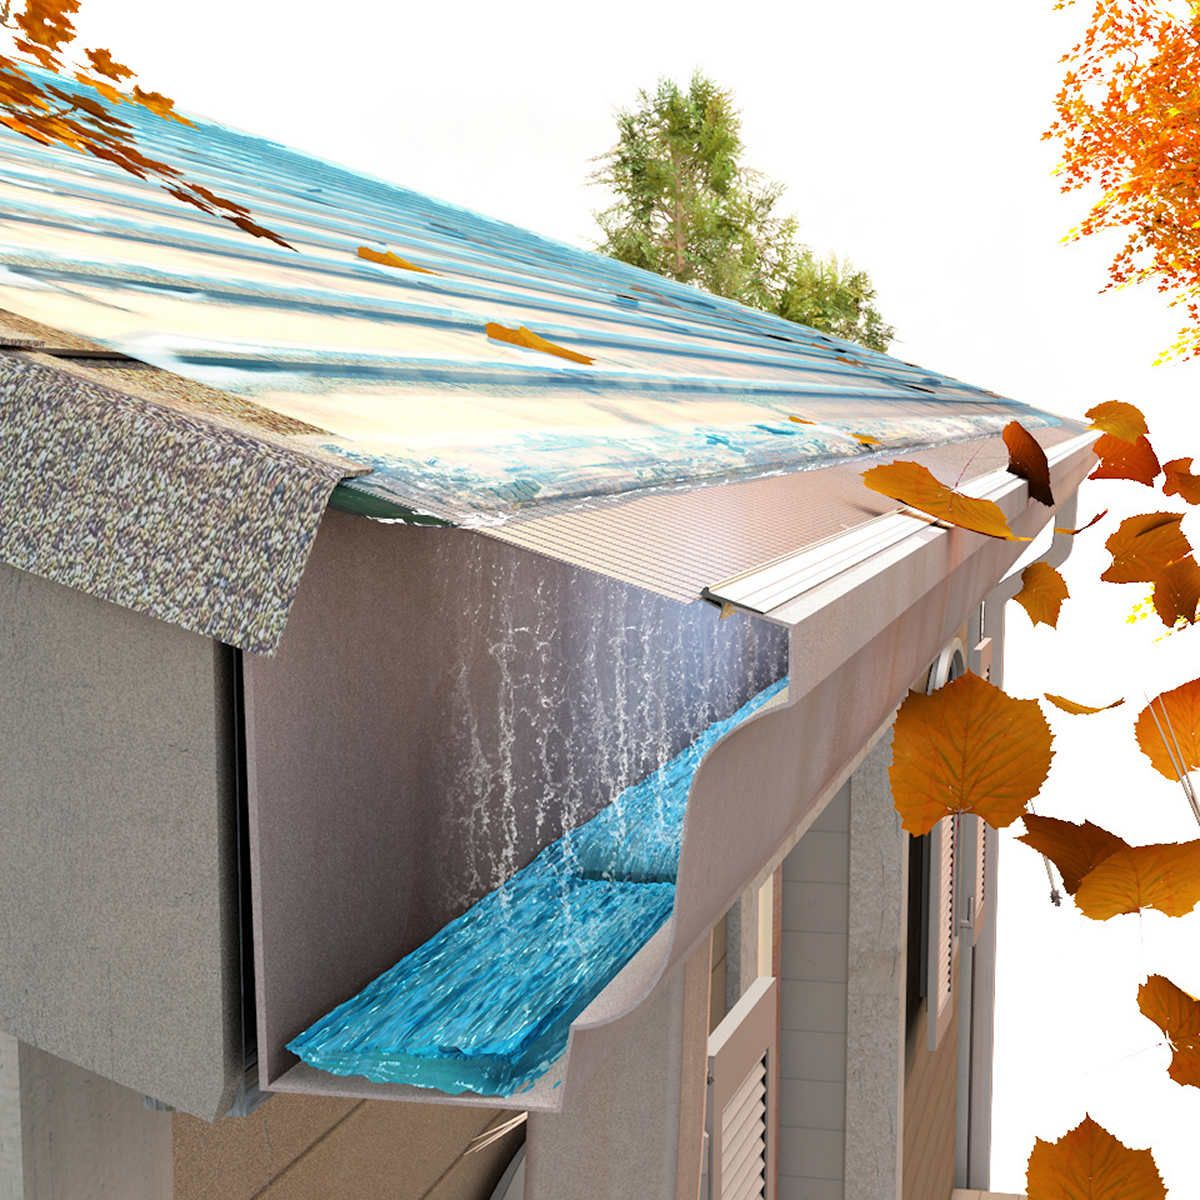 Easyon Gutterguard 5 Version 100 In 2020 House Exterior House Design Architecture